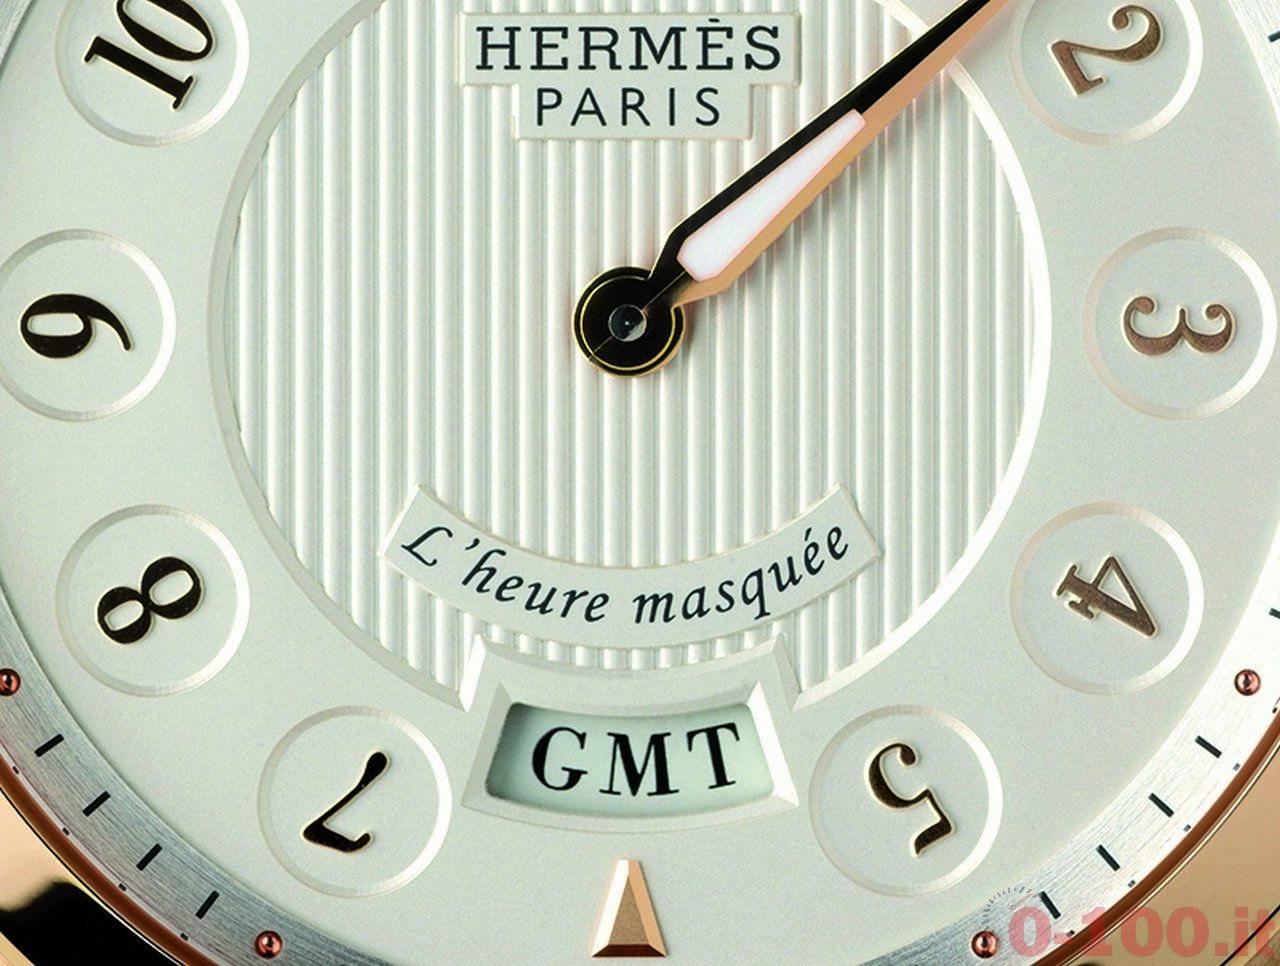 baselworld-2014-Hermès Dressage L'heure masque_0-1003